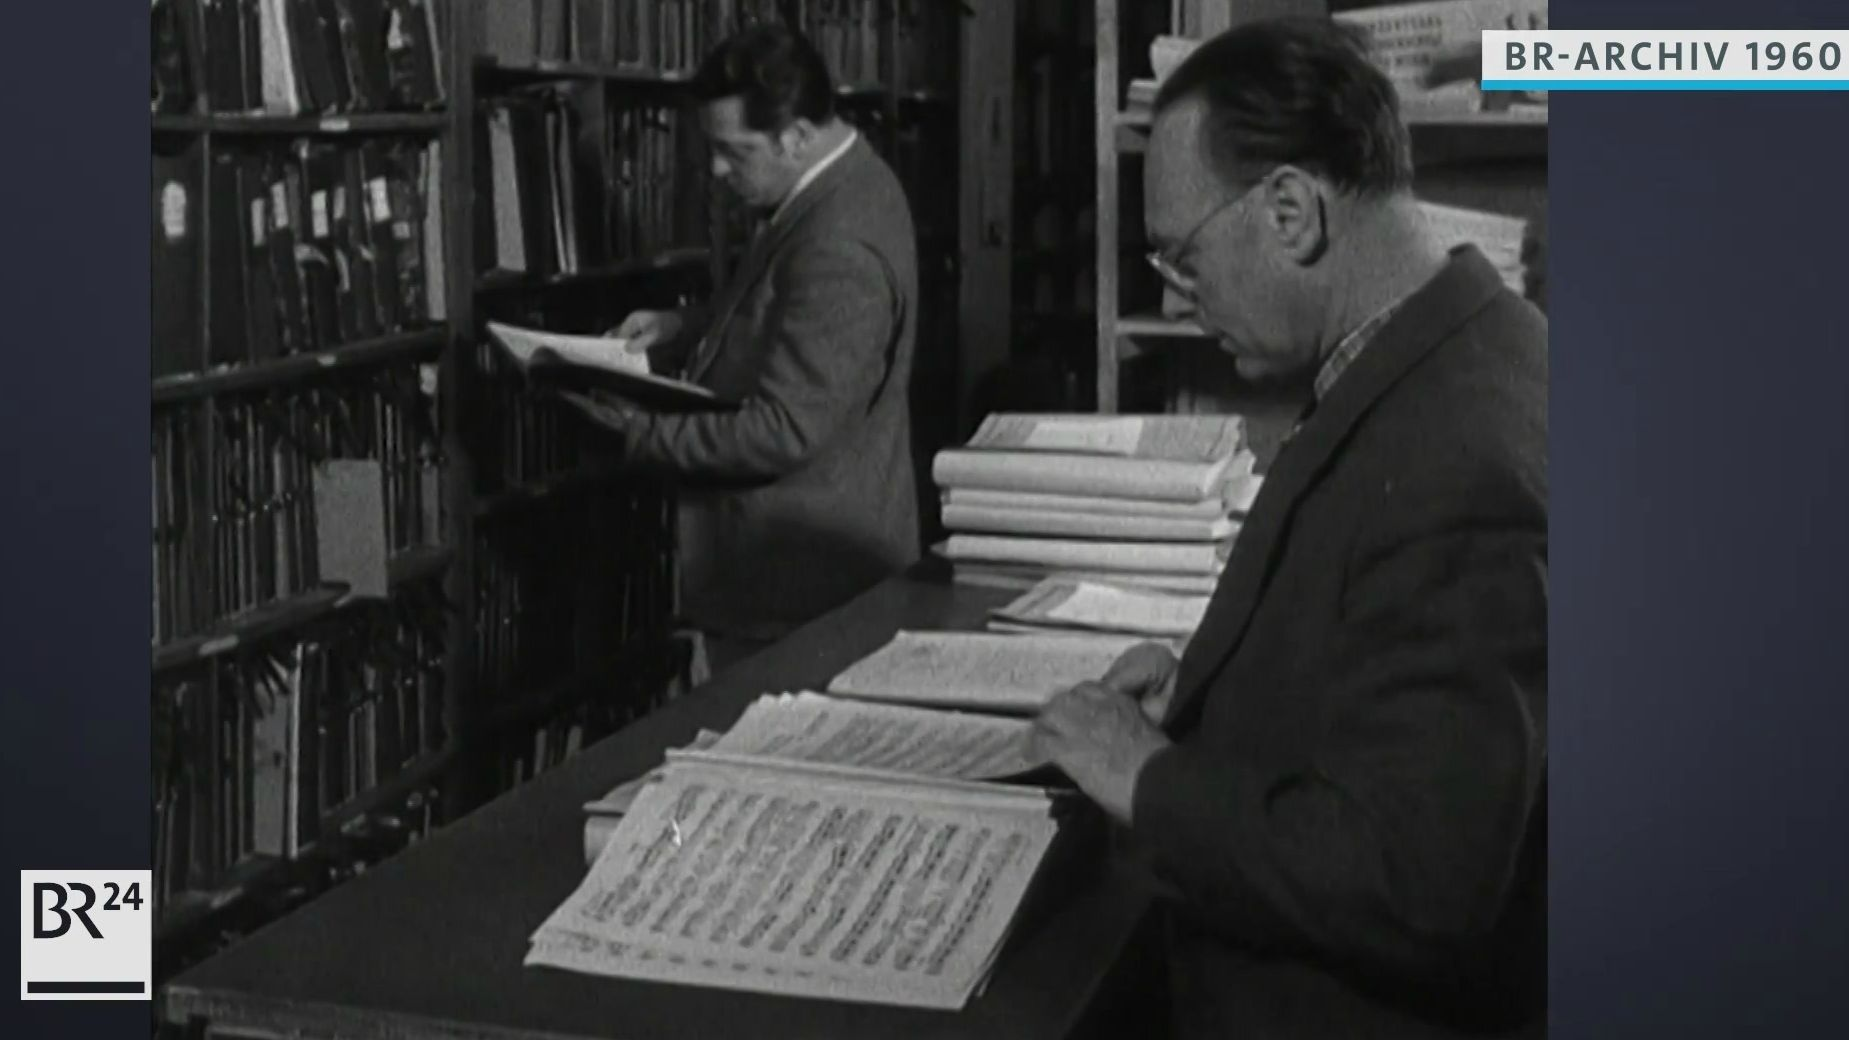 Archivare im Notenarchiv.